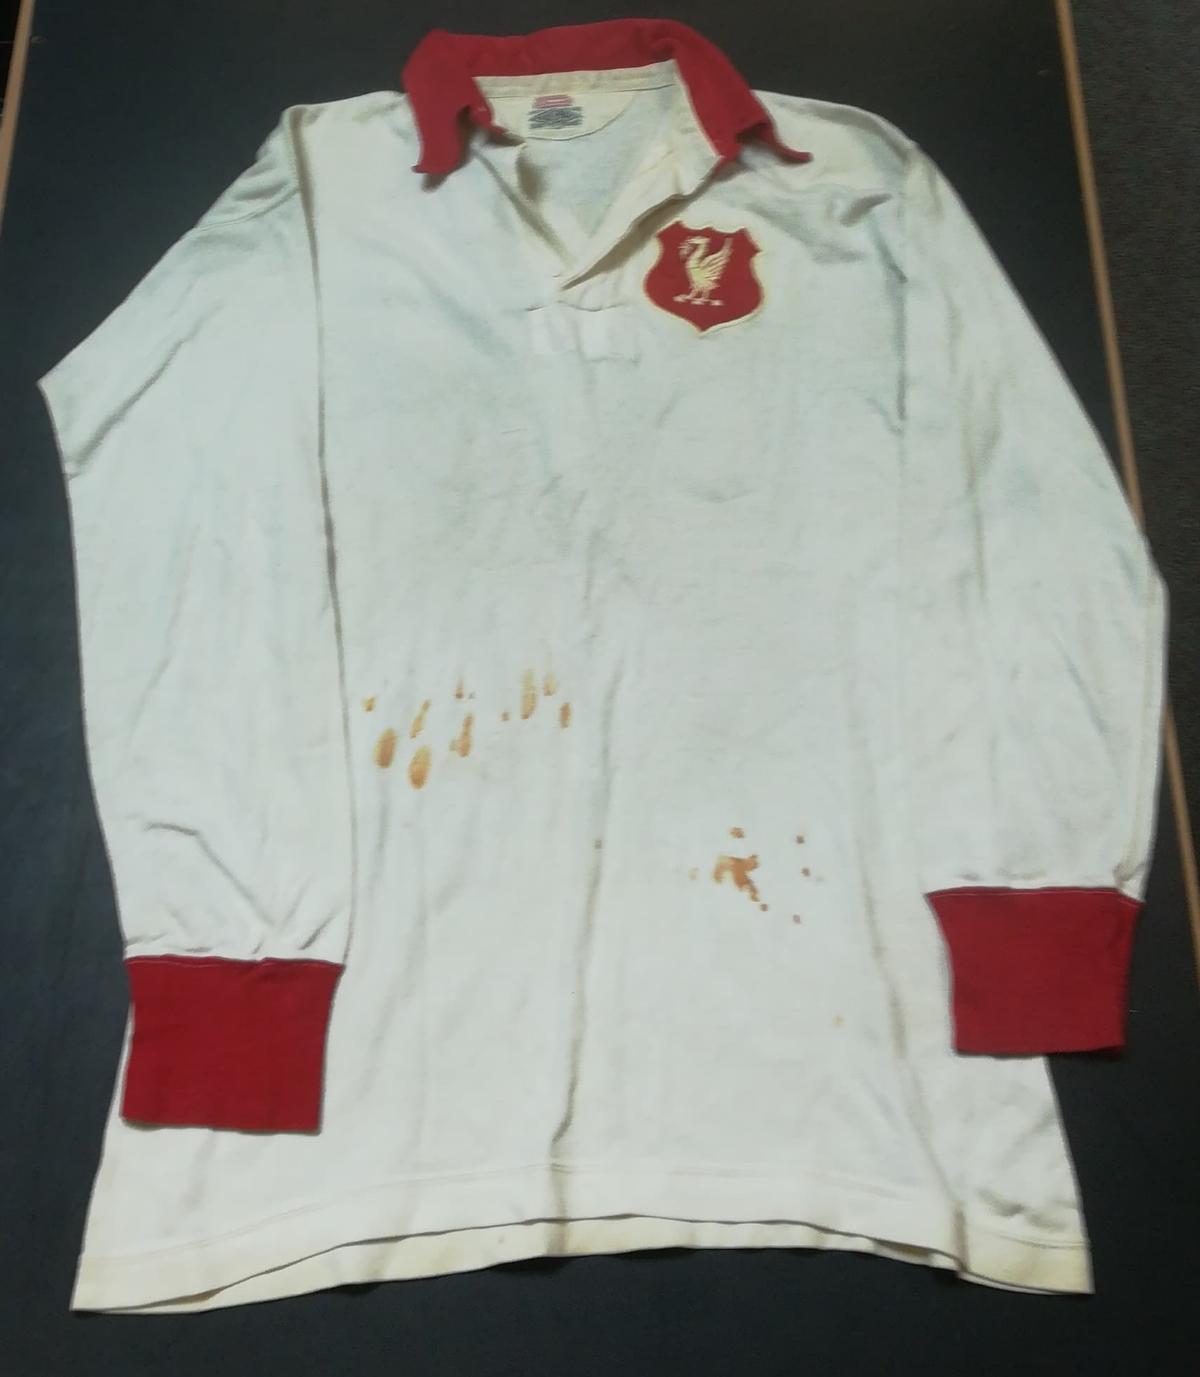 1950 FA Cup final shirt value